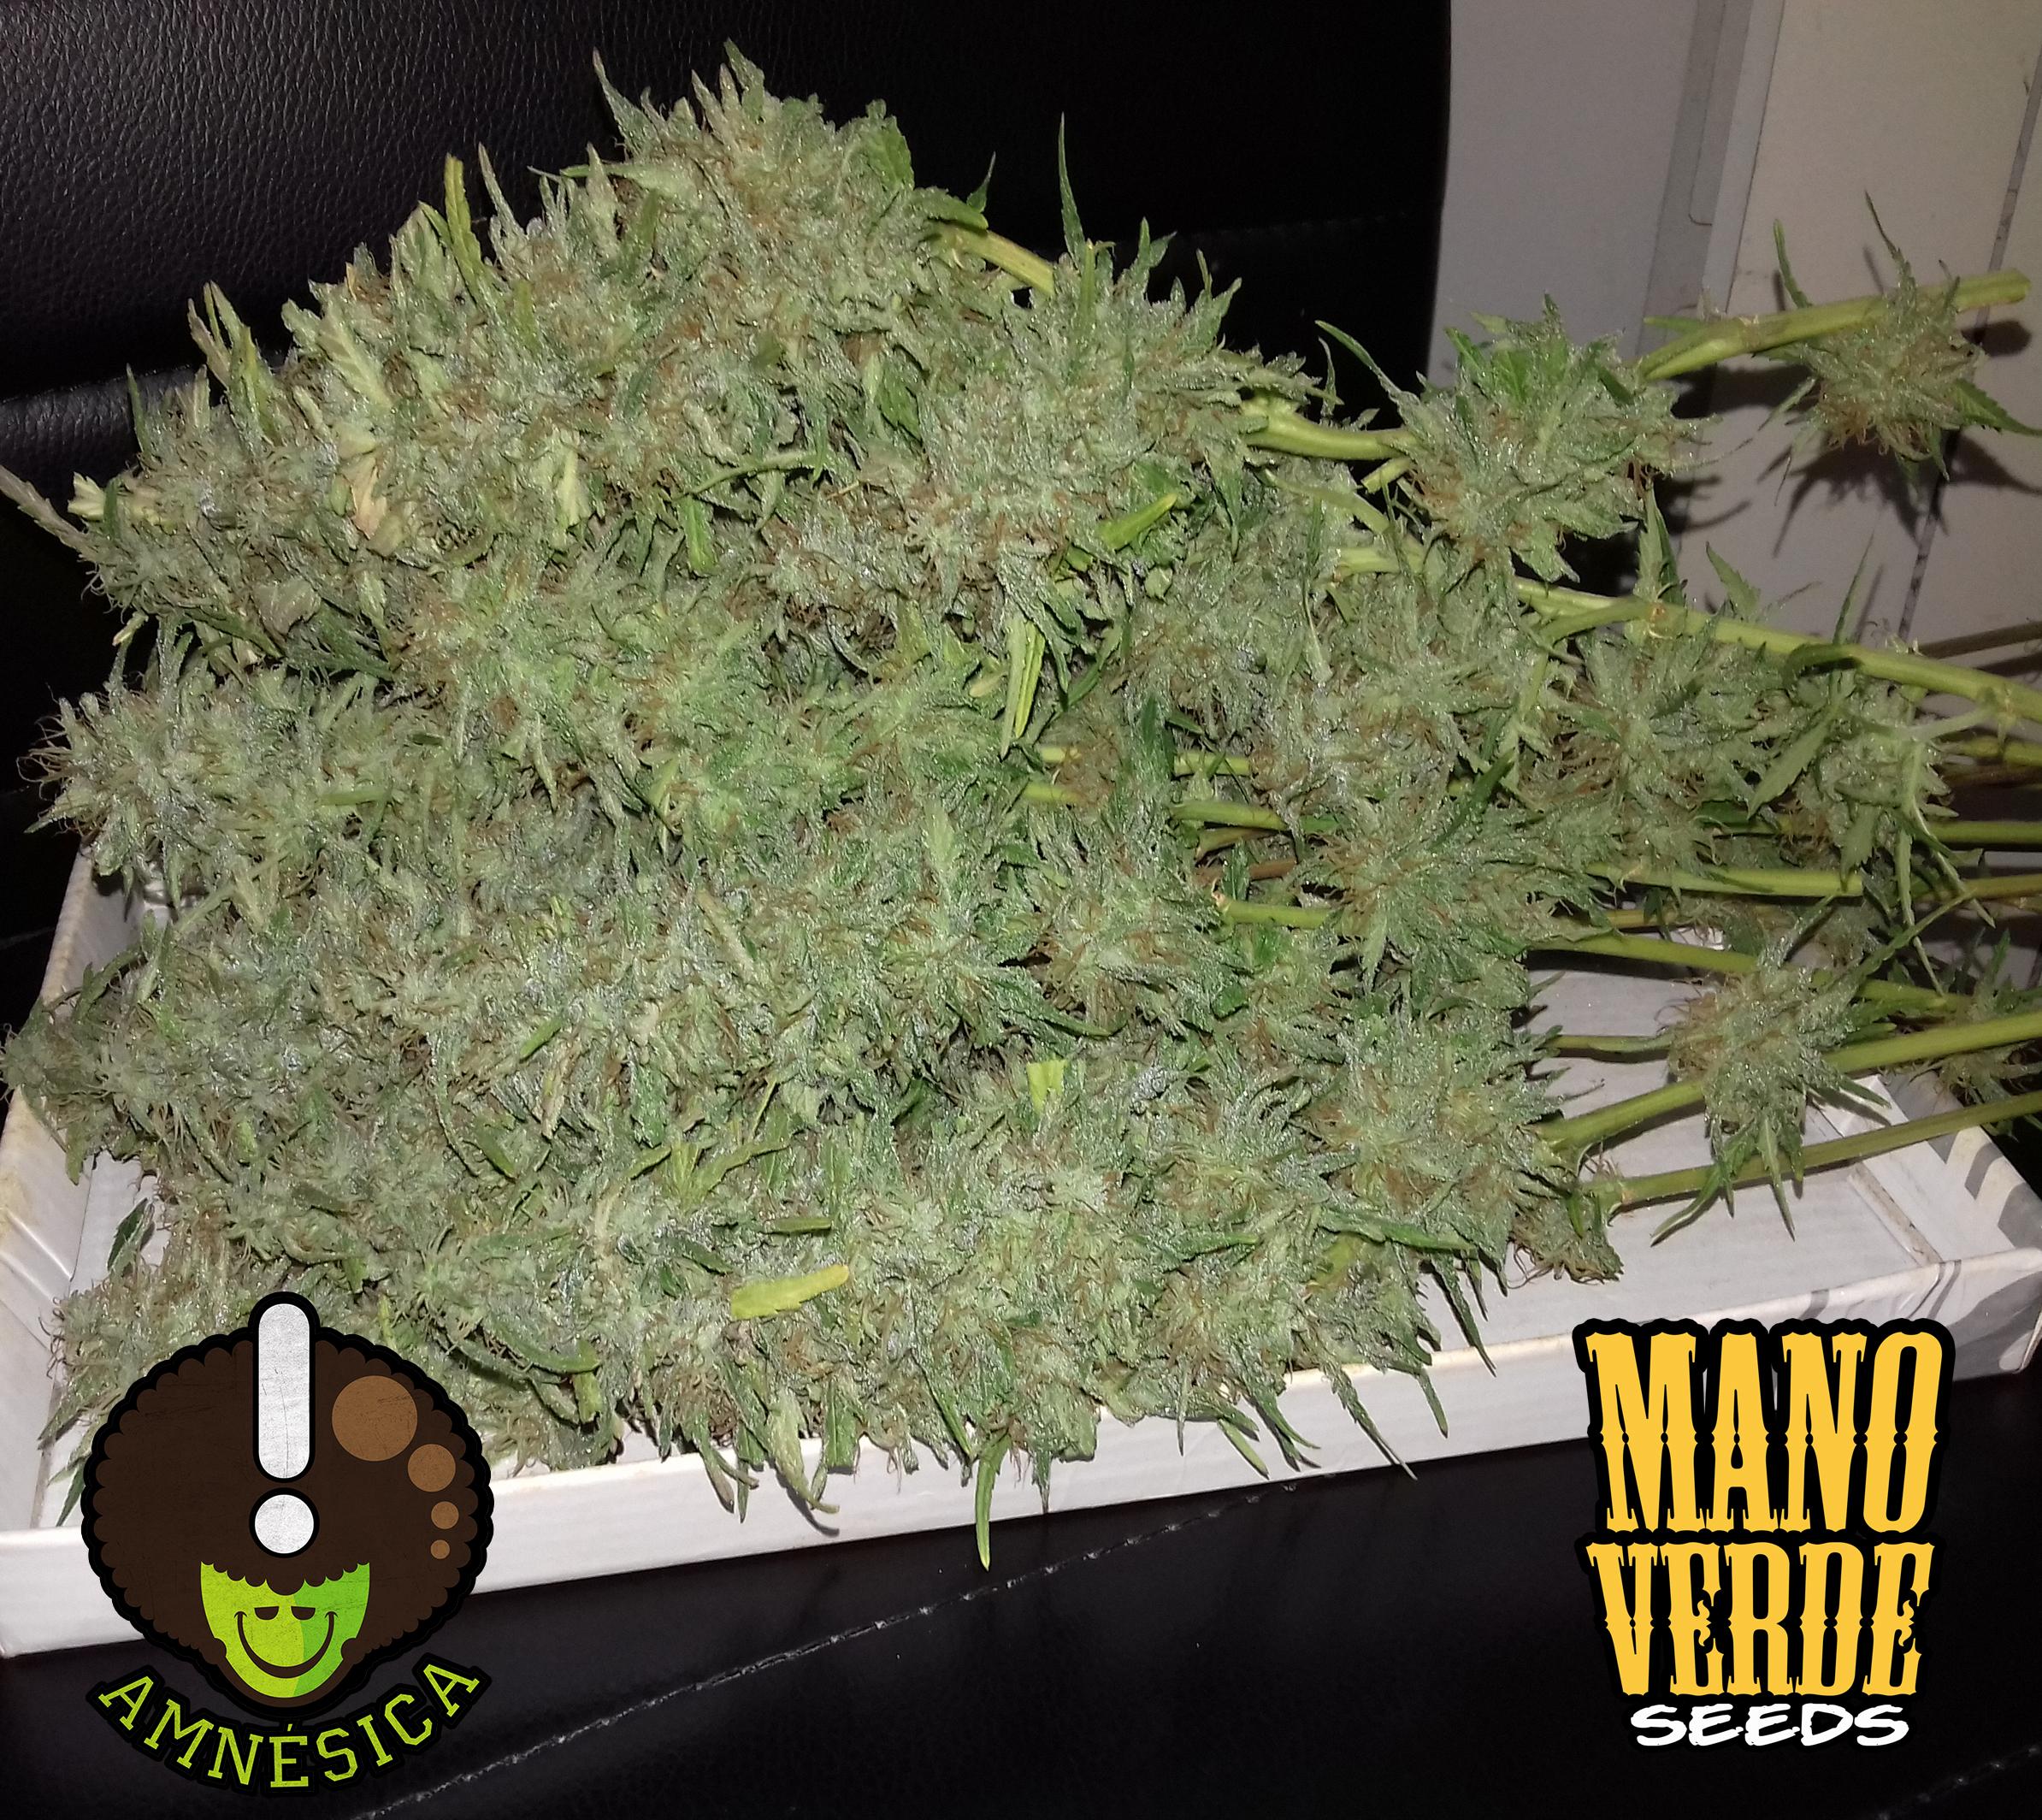 amnesica-manoverde-seeds-75f-230